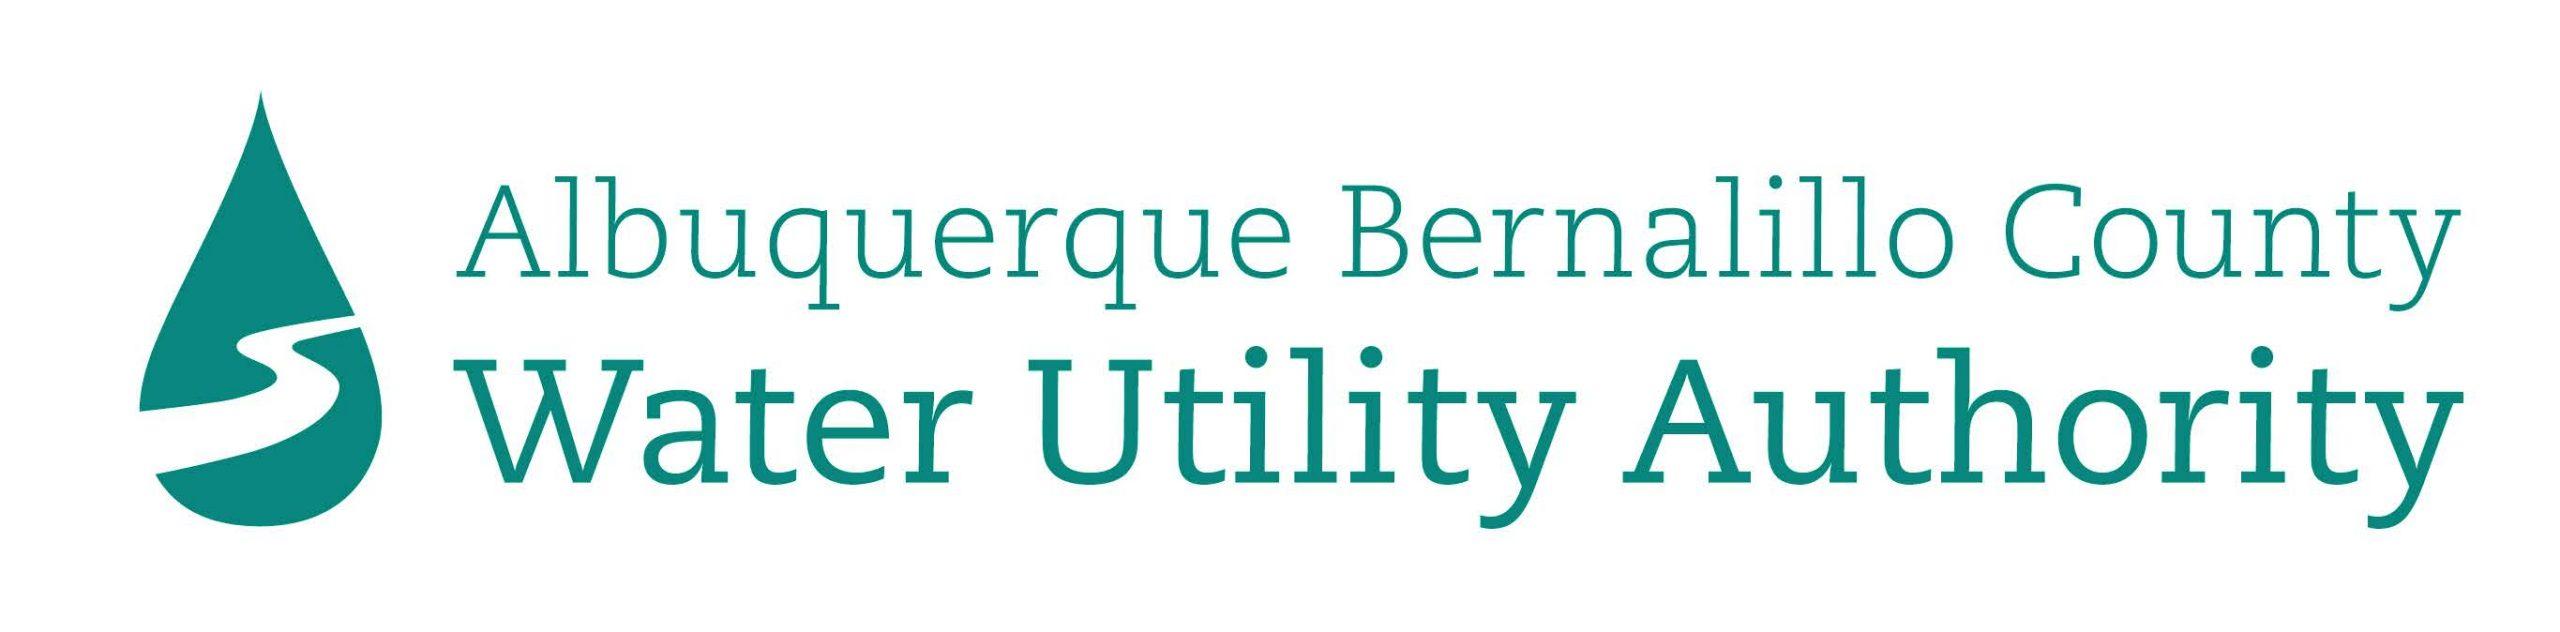 ALBUQUERQUE-BERNALILLO-COUNTY-WATER-UTILITY-AUTHORITY